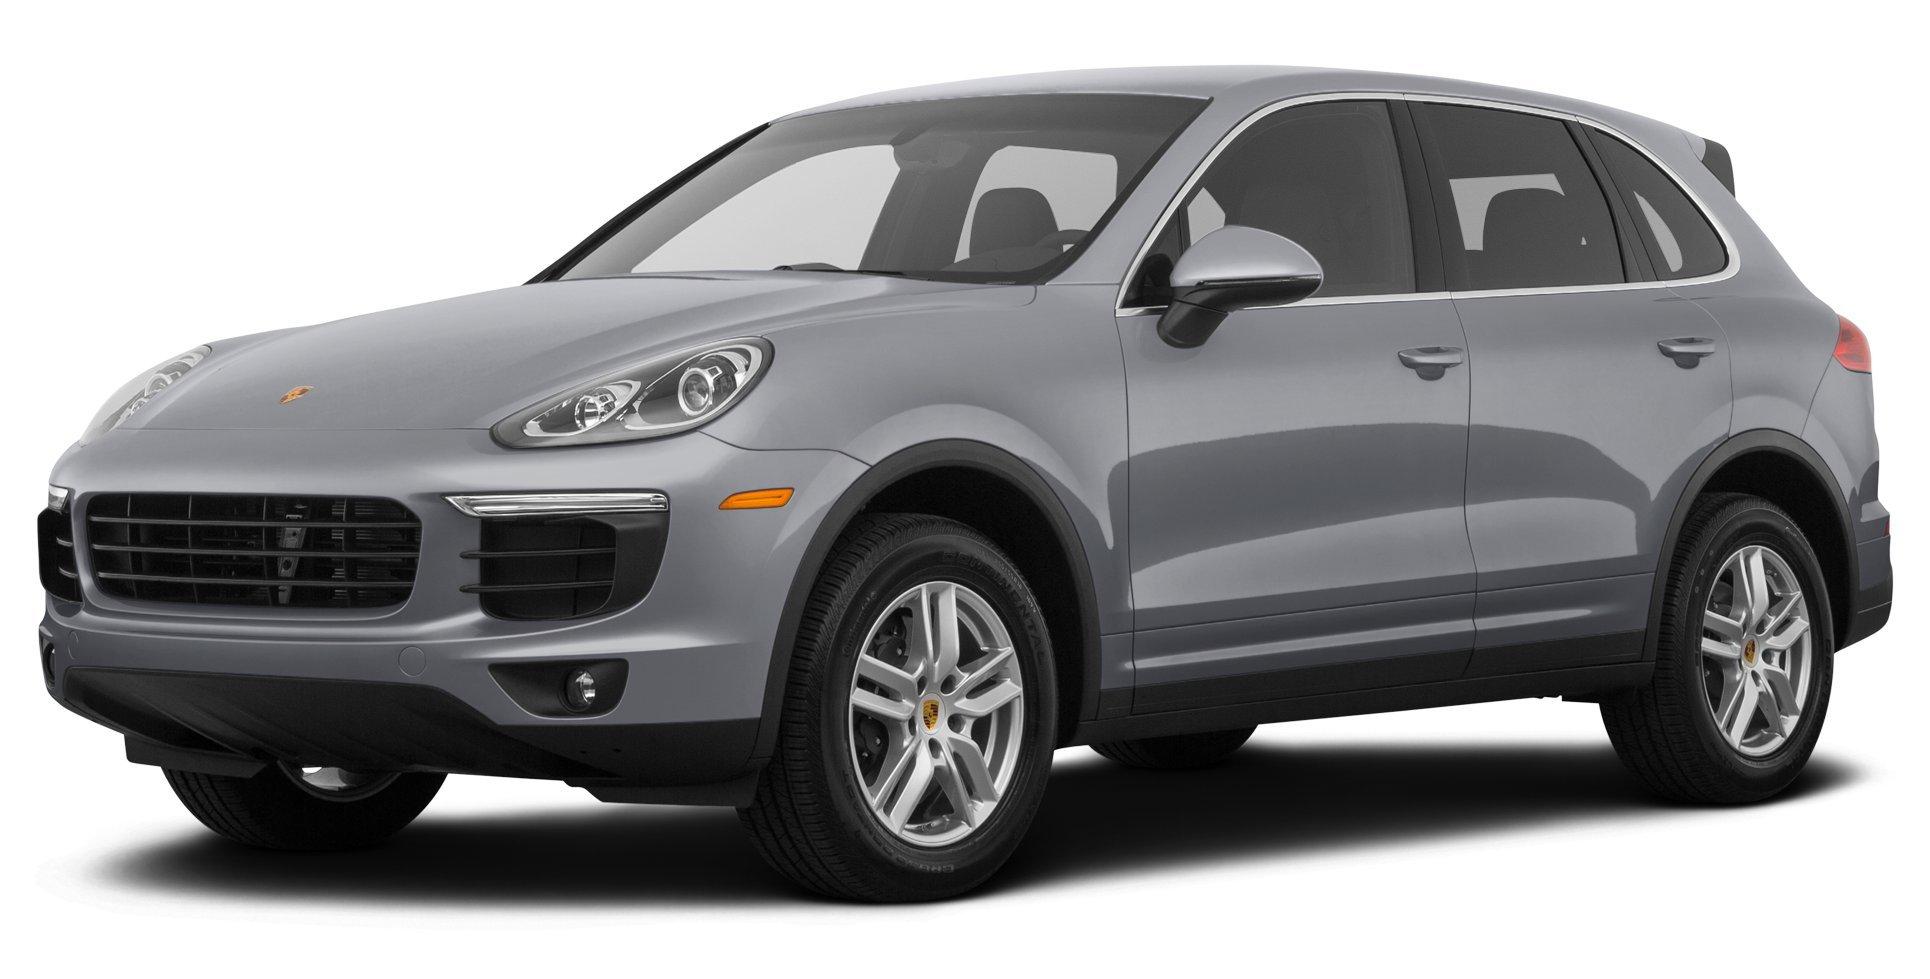 ... 2018 Porsche Cayenne, All Wheel Drive